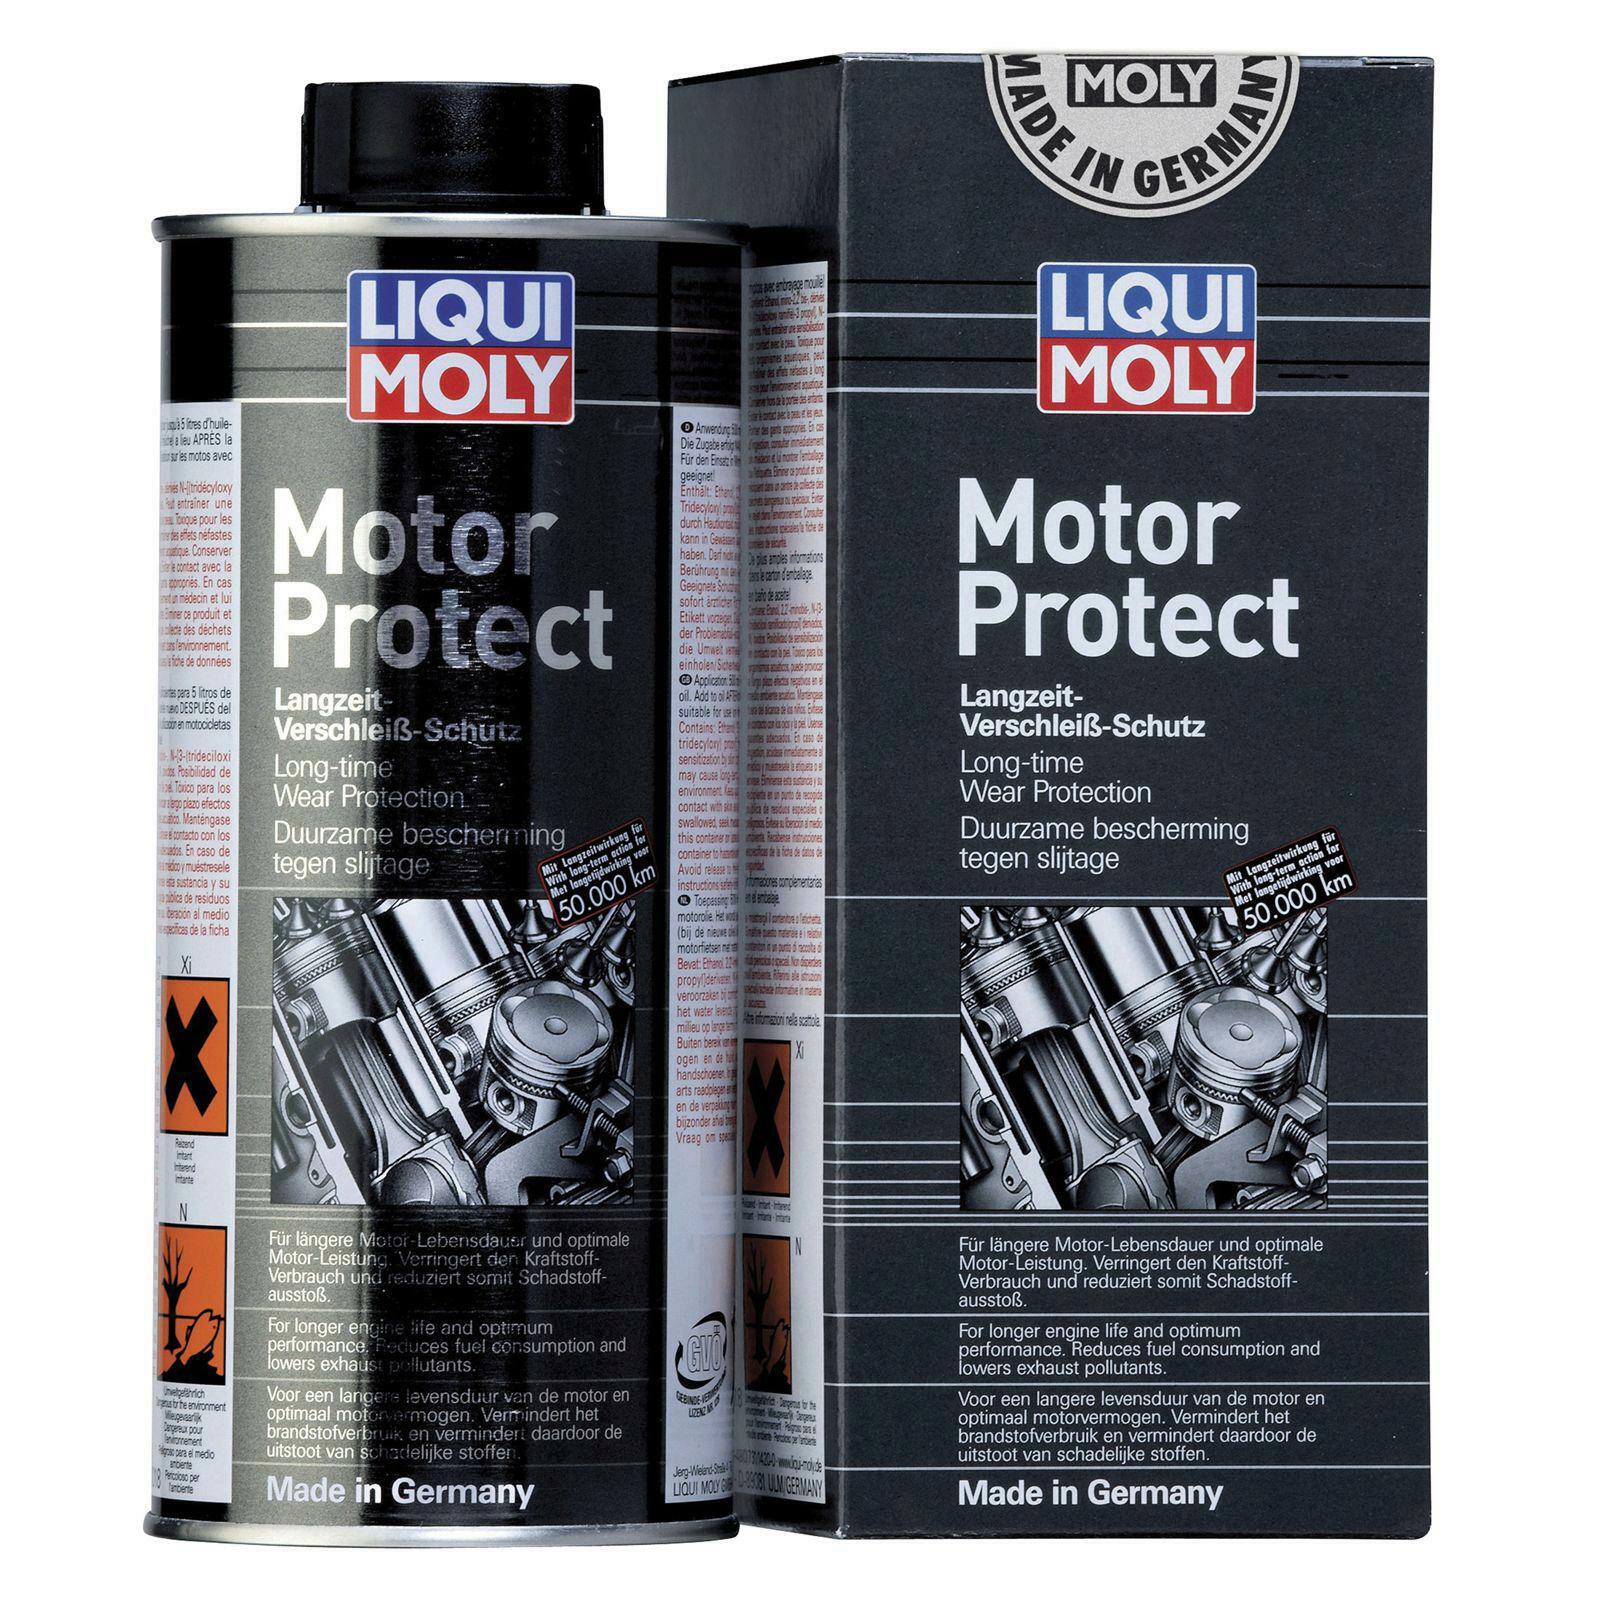 Liqui Moly MotorProtect 500ml